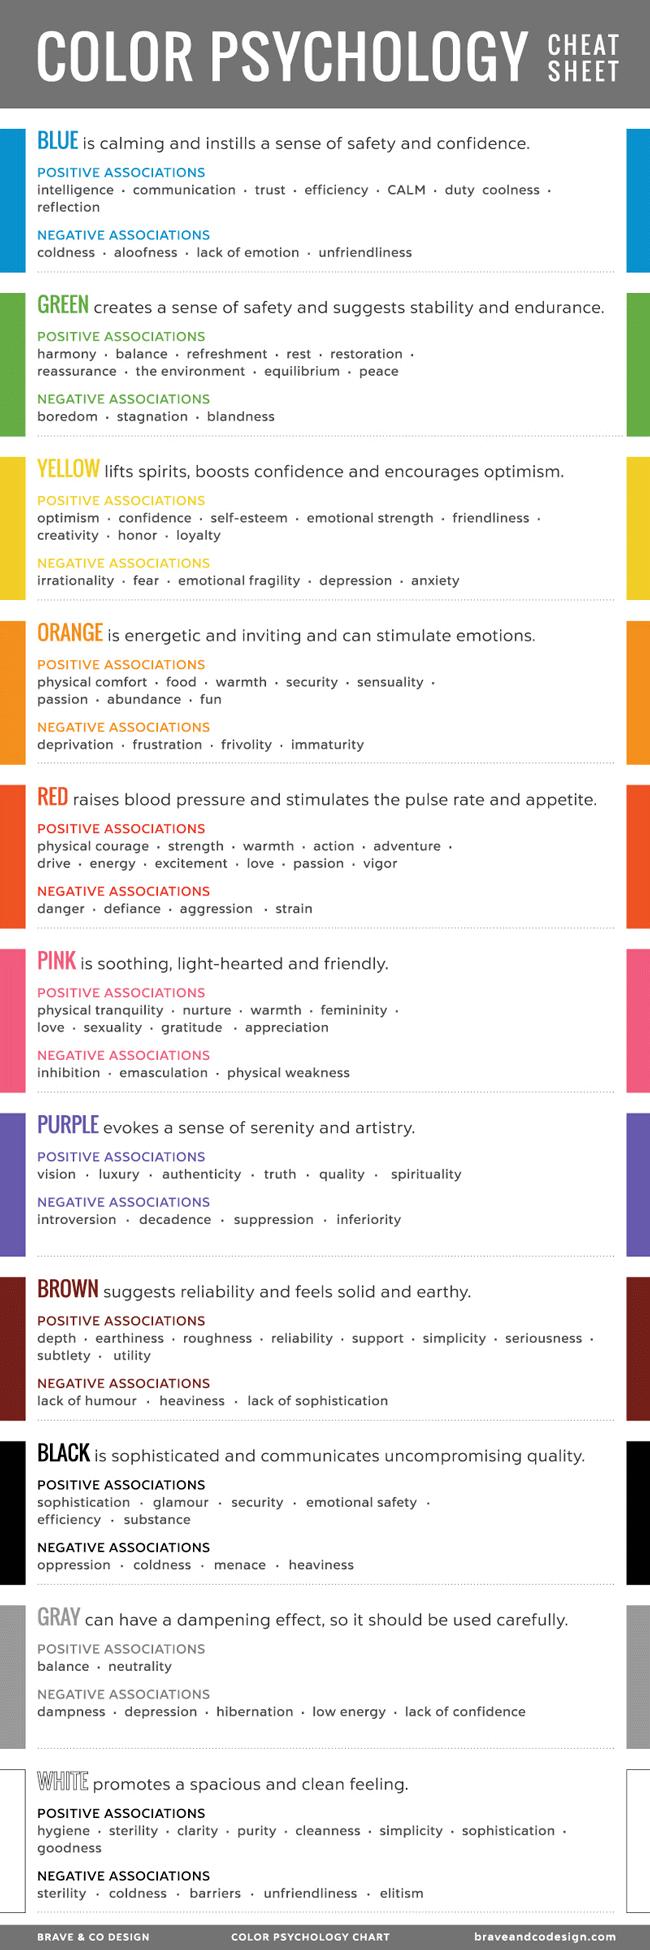 color-psychology-cheatsheet